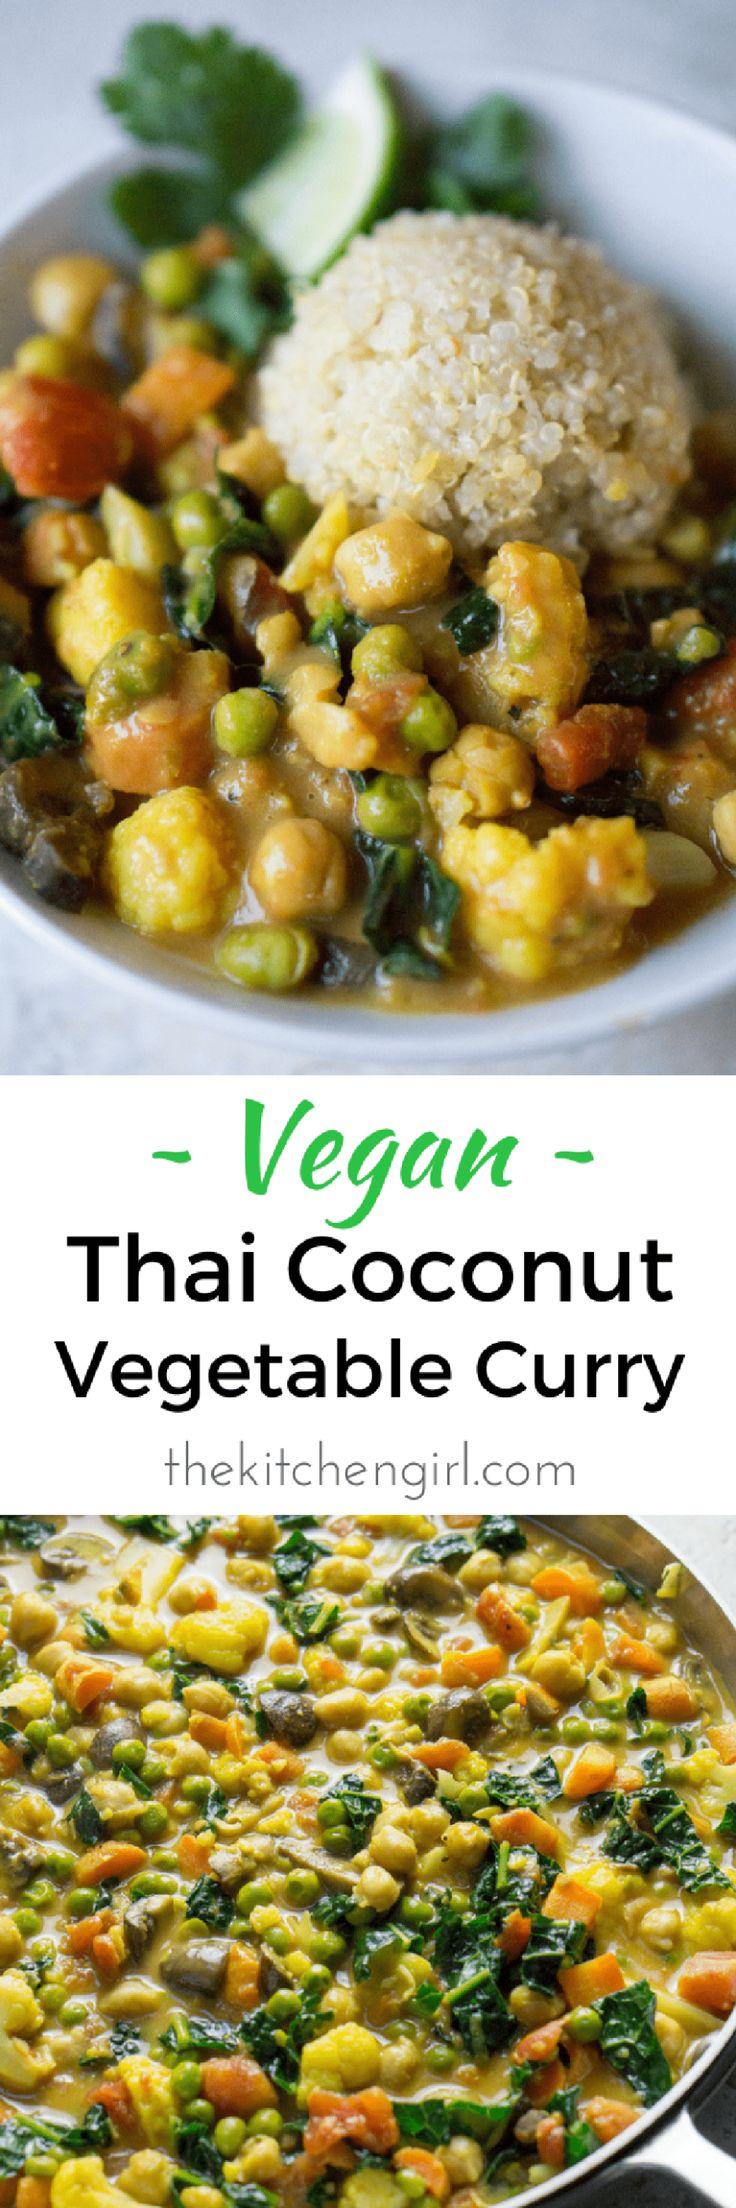 Easy vegan Thai comfort food in 30?…yes plz! Simple veggies, curry powder, and coconut milk. Vegan Thai Coconut Vegetable Curry thekitchengirl.com #vegan #curry #thaicoconut #skilletmeal #glutenfree